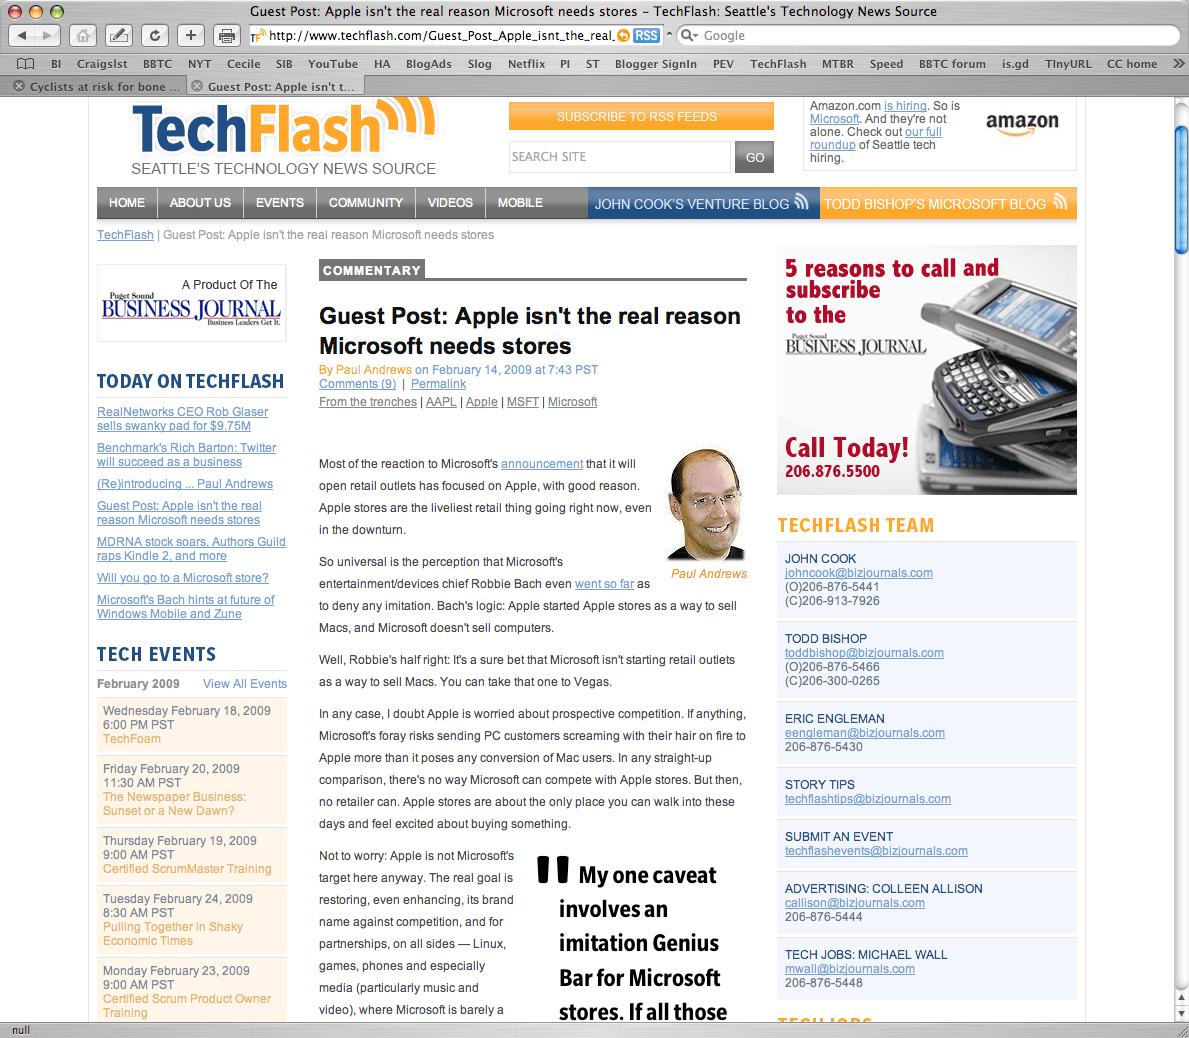 TechFlash gets online journalism